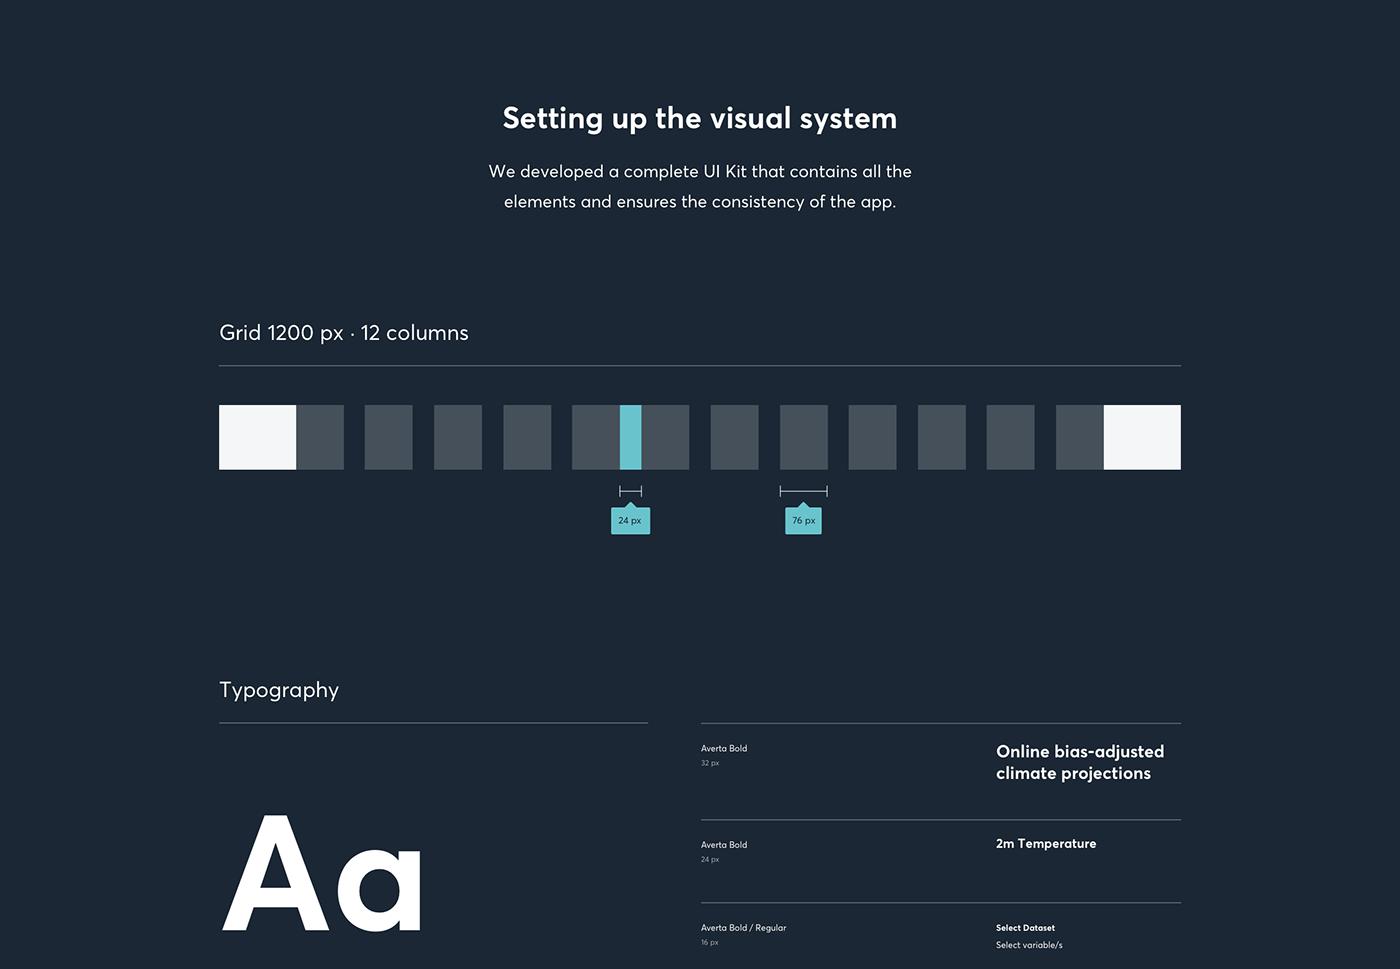 adjust app Bias climadjust climate Dataset experiments gradient SAAS UserExperience